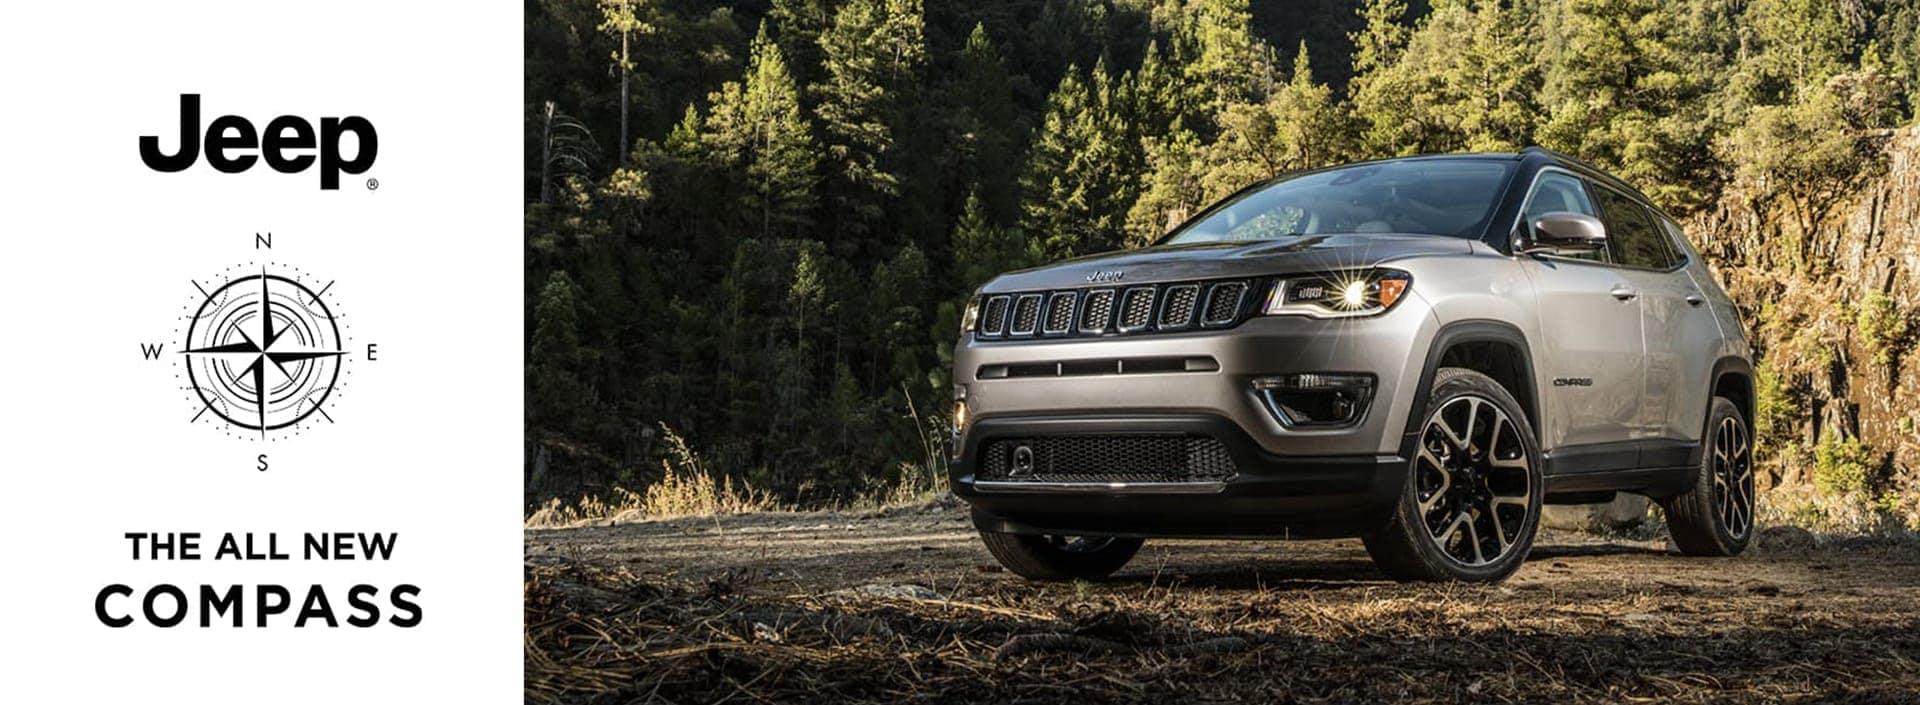 FCA_jeep